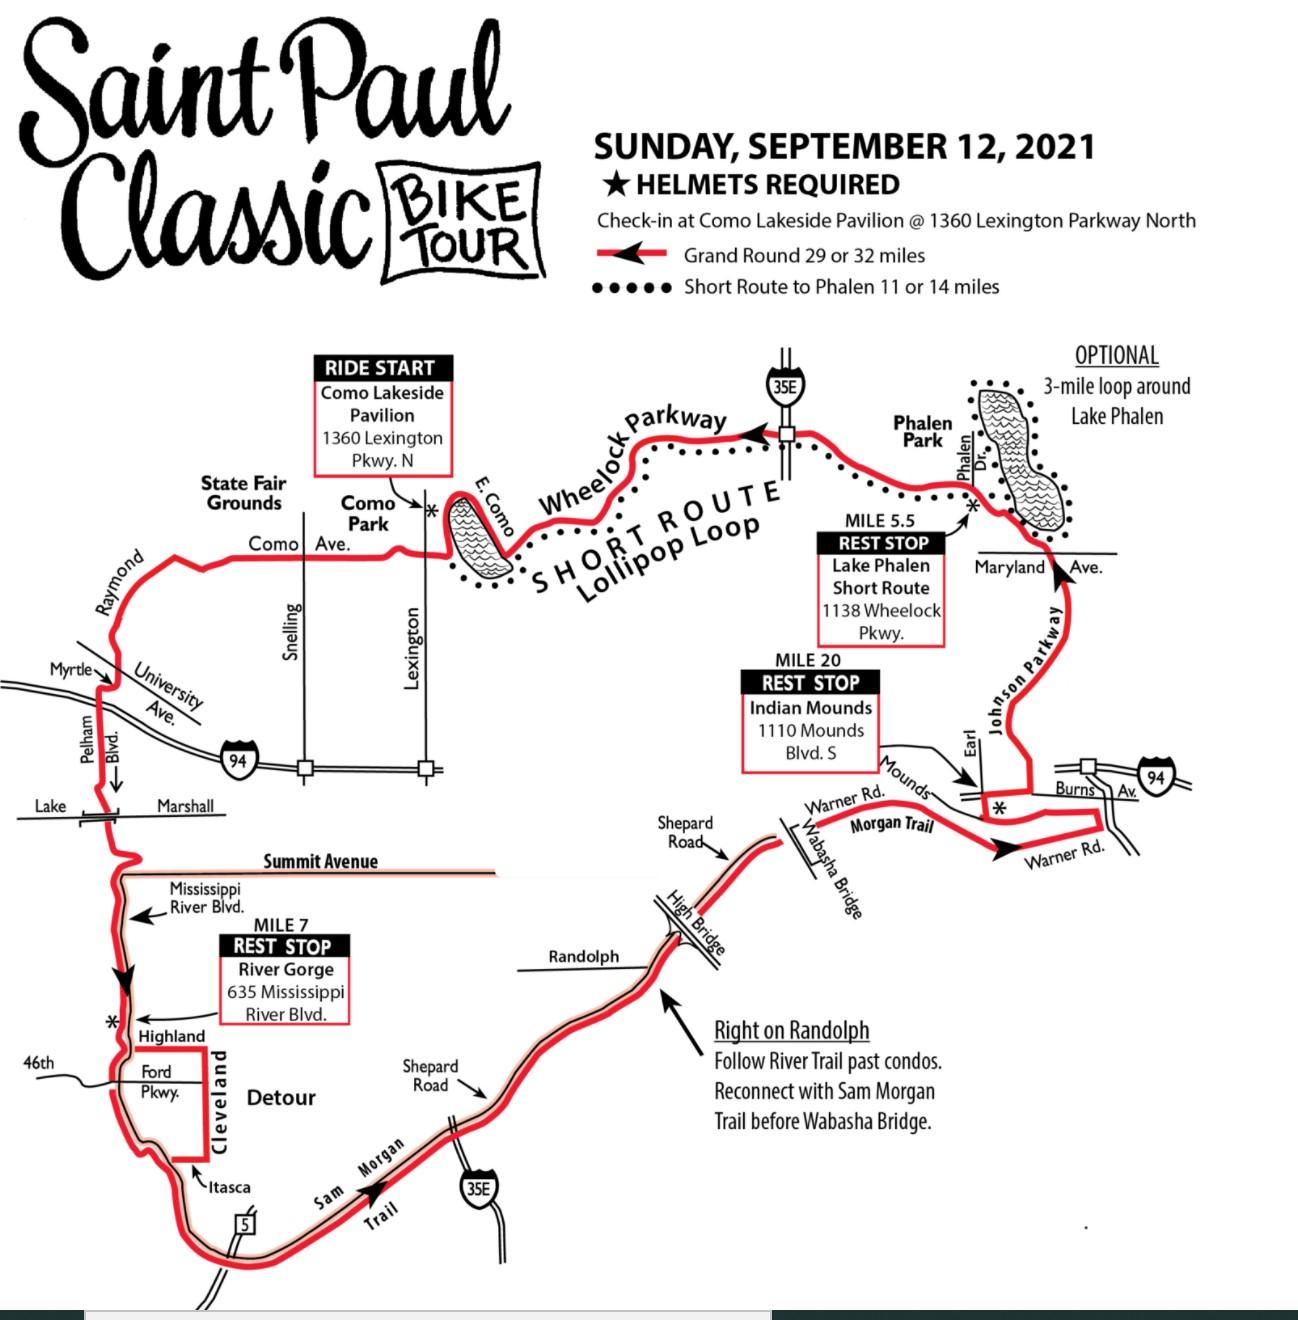 bike classic 2021 route map